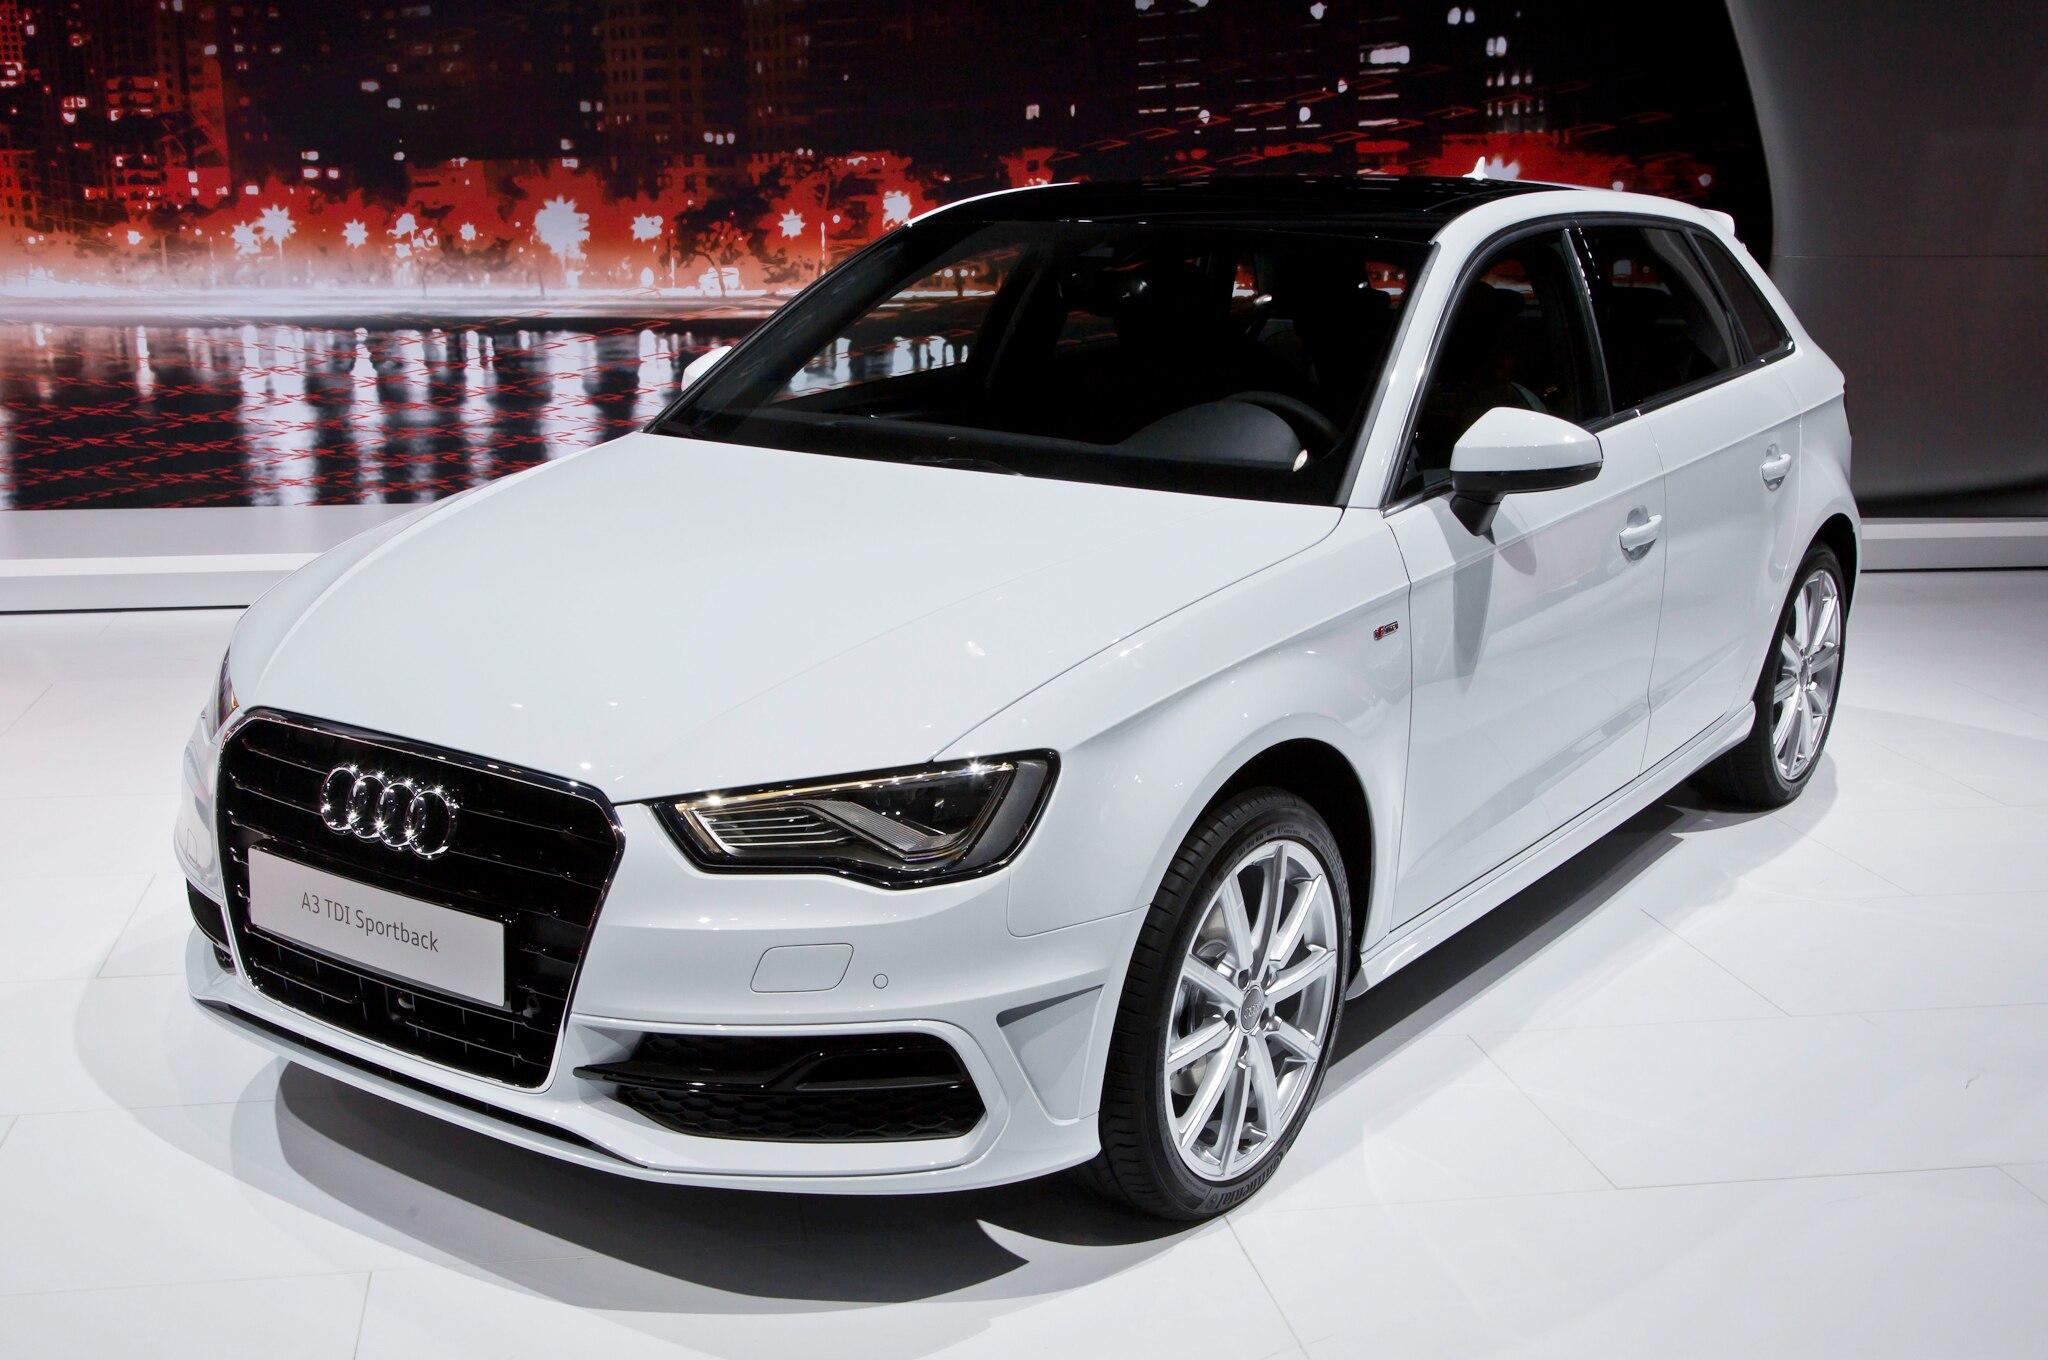 2016 Audi A3 Tdi Hatchback Joins Lineup Automobile Magazine